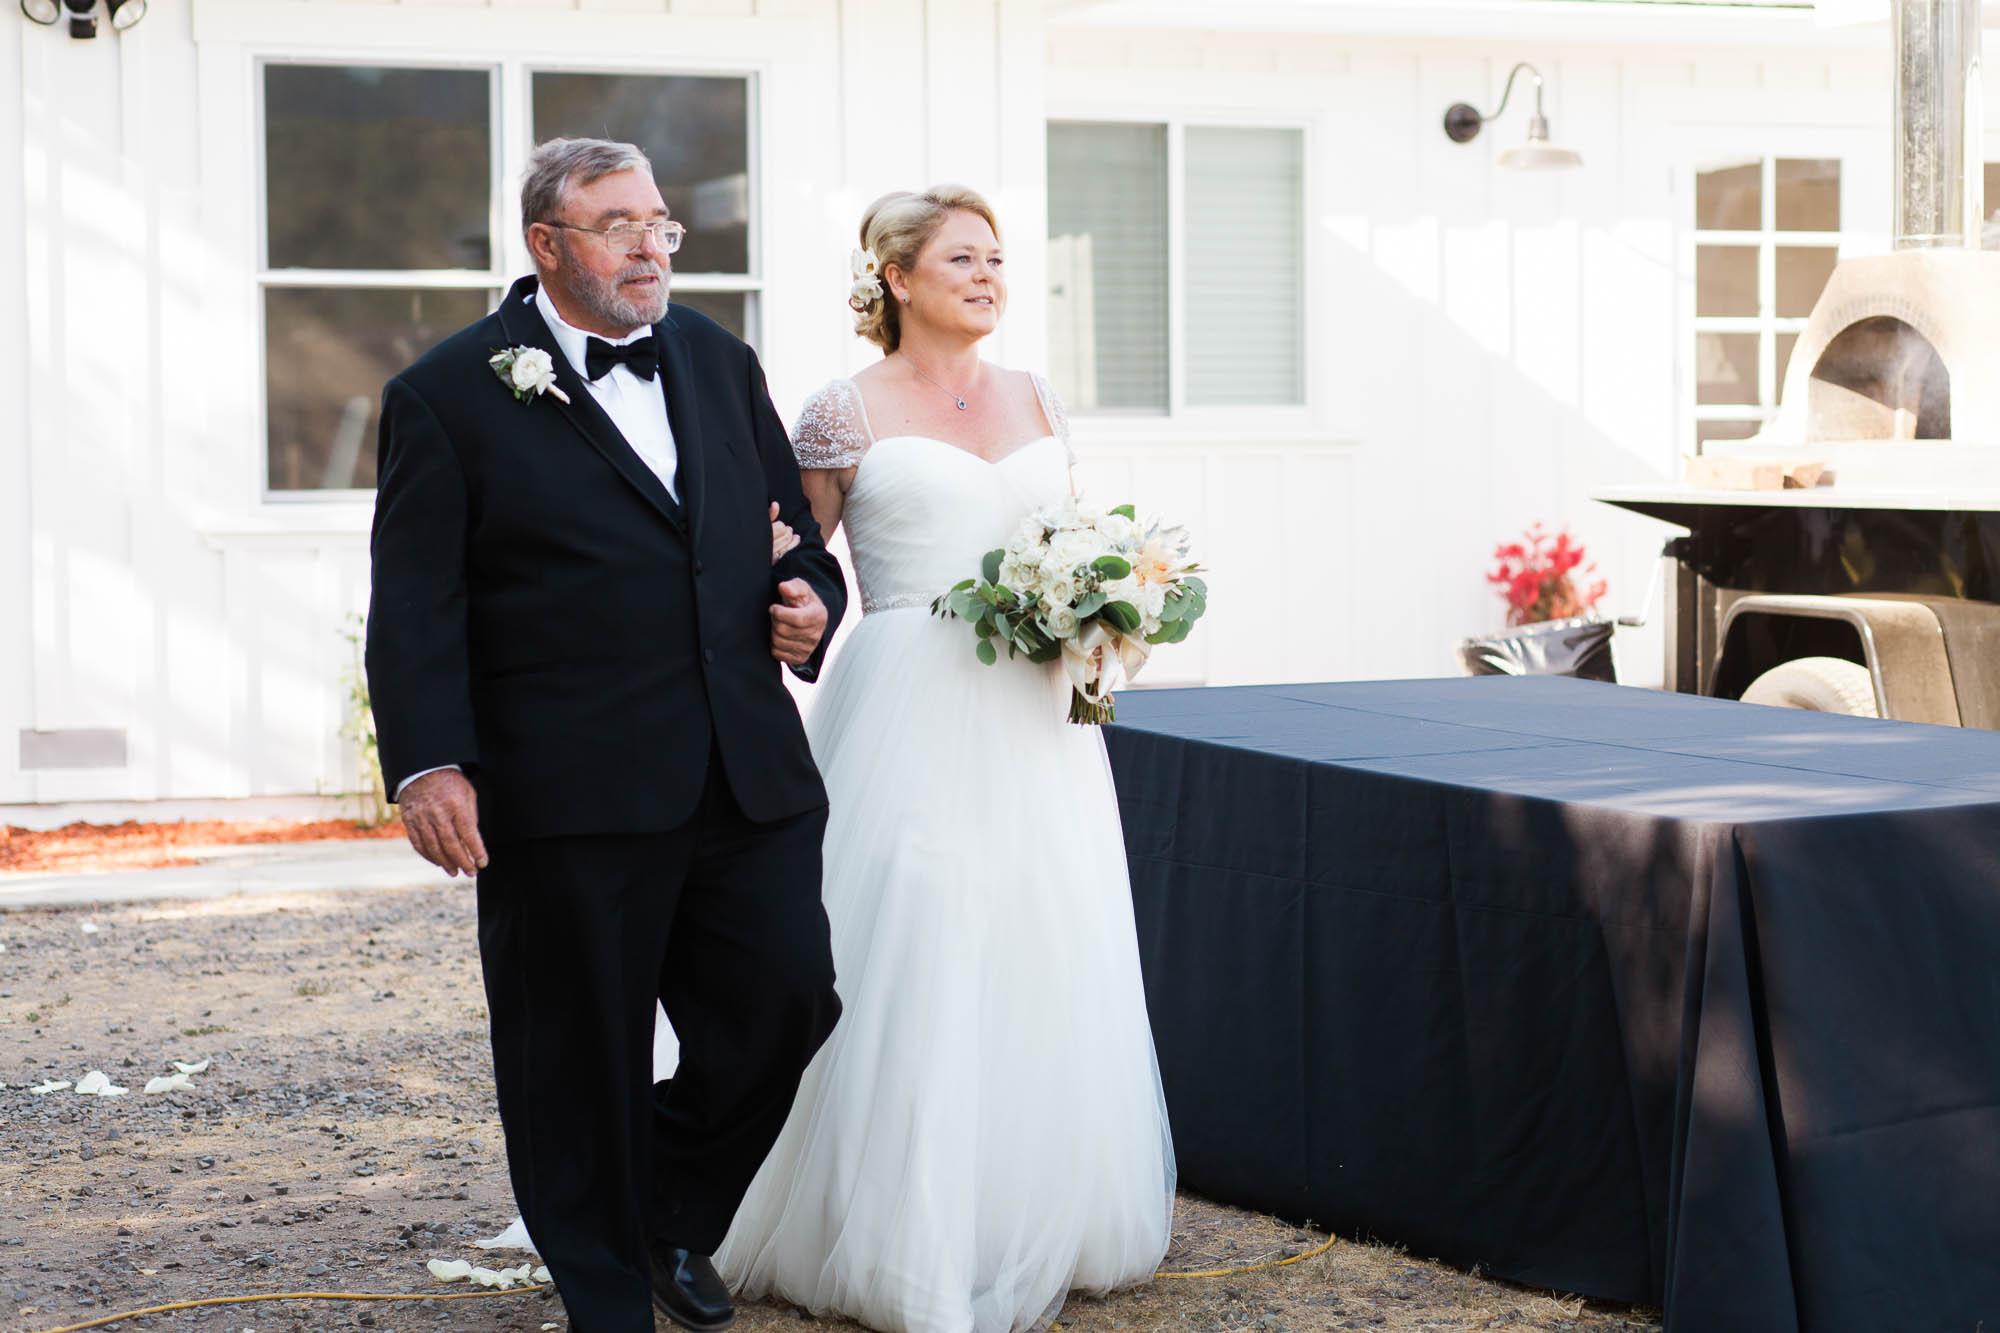 BACKYARD VINEYARD NAPA WEDDING MARIA VILLANO